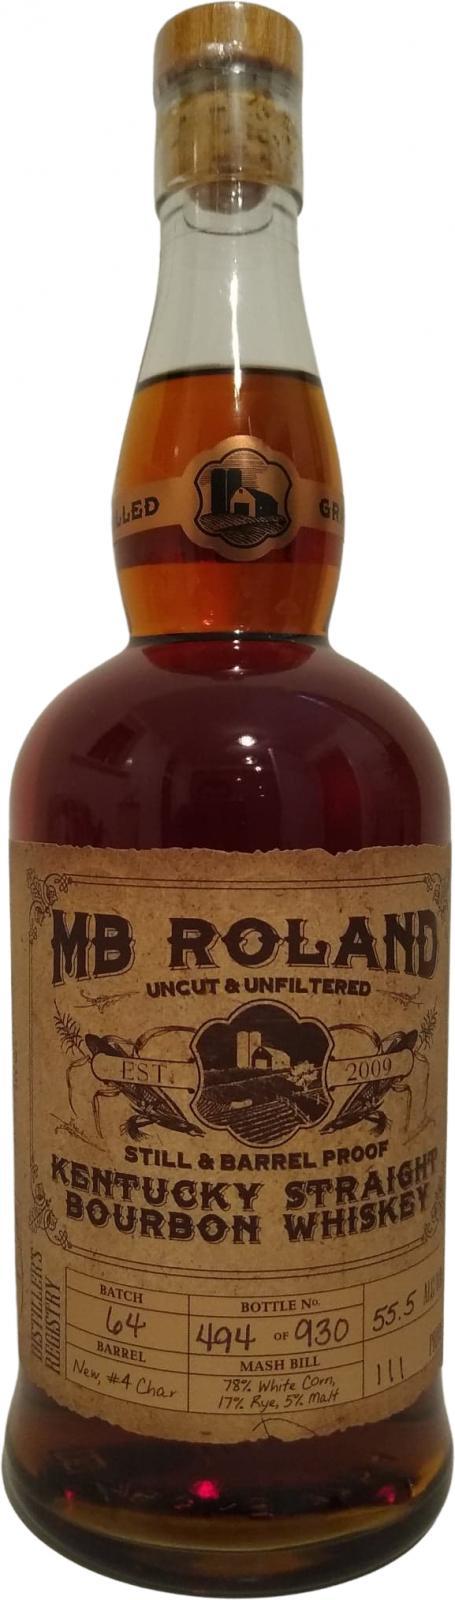 MB Roland Kentucky Straight Bourbon Whiskey